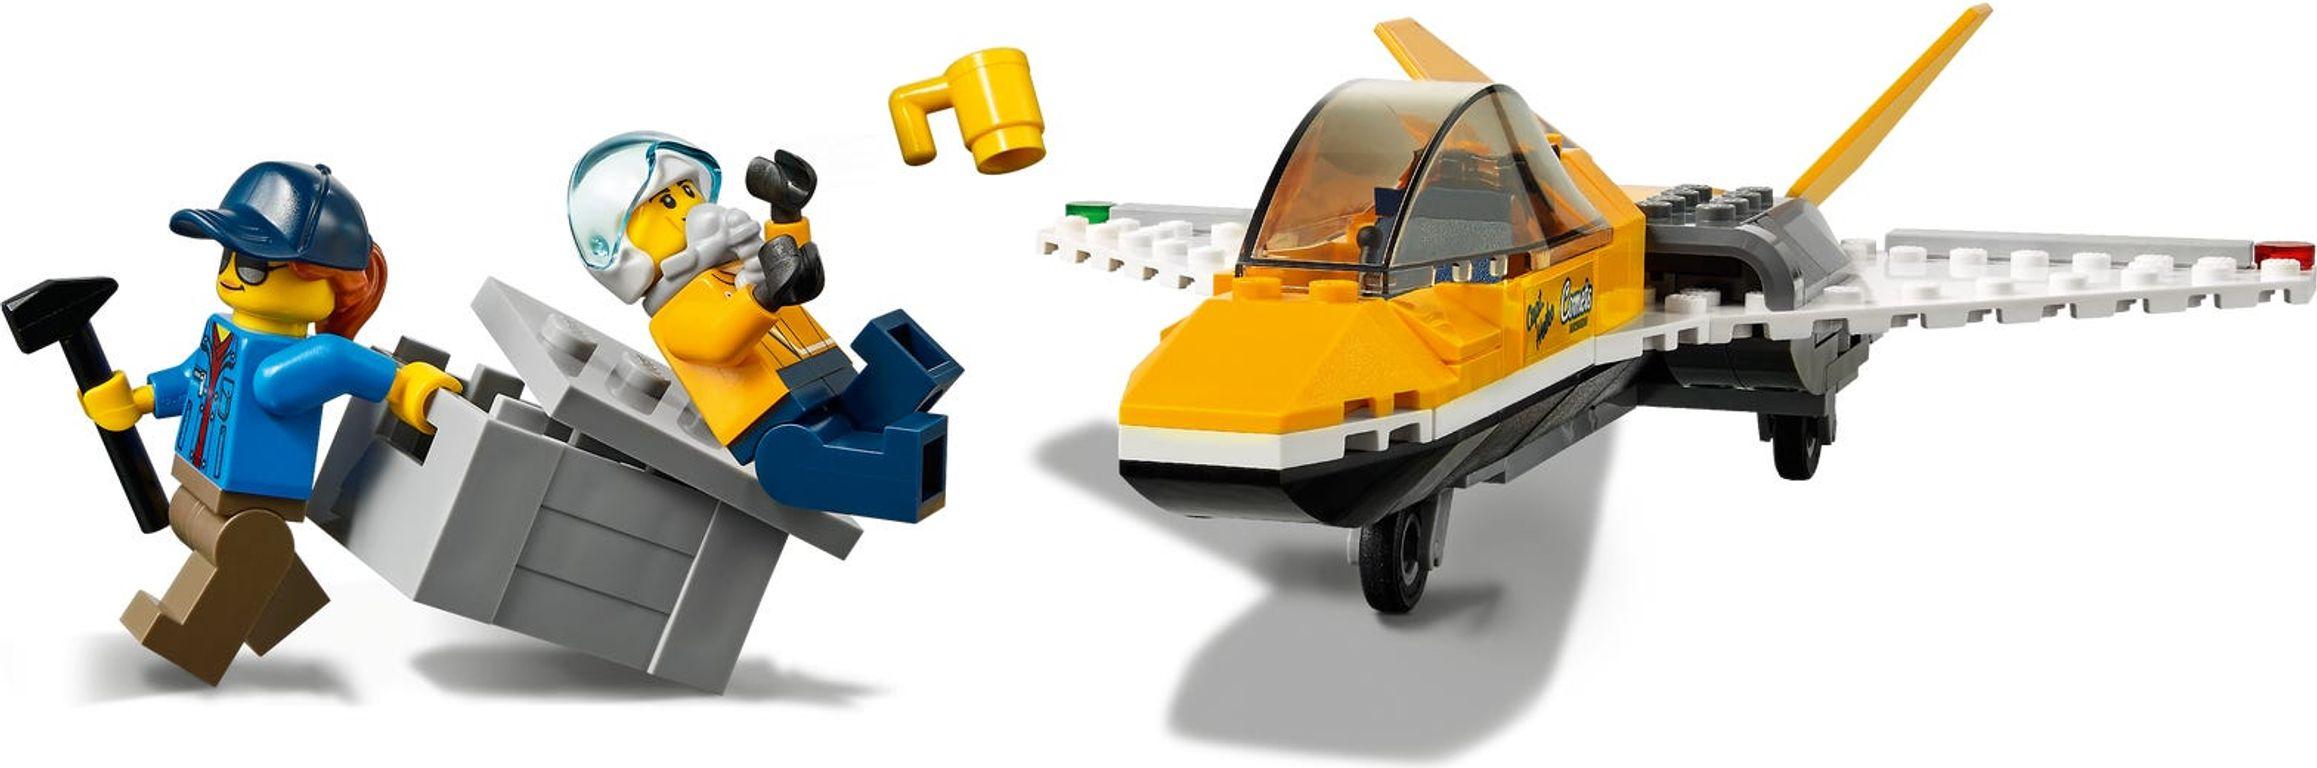 LEGO® City Airshow Jet Transporter minifigures